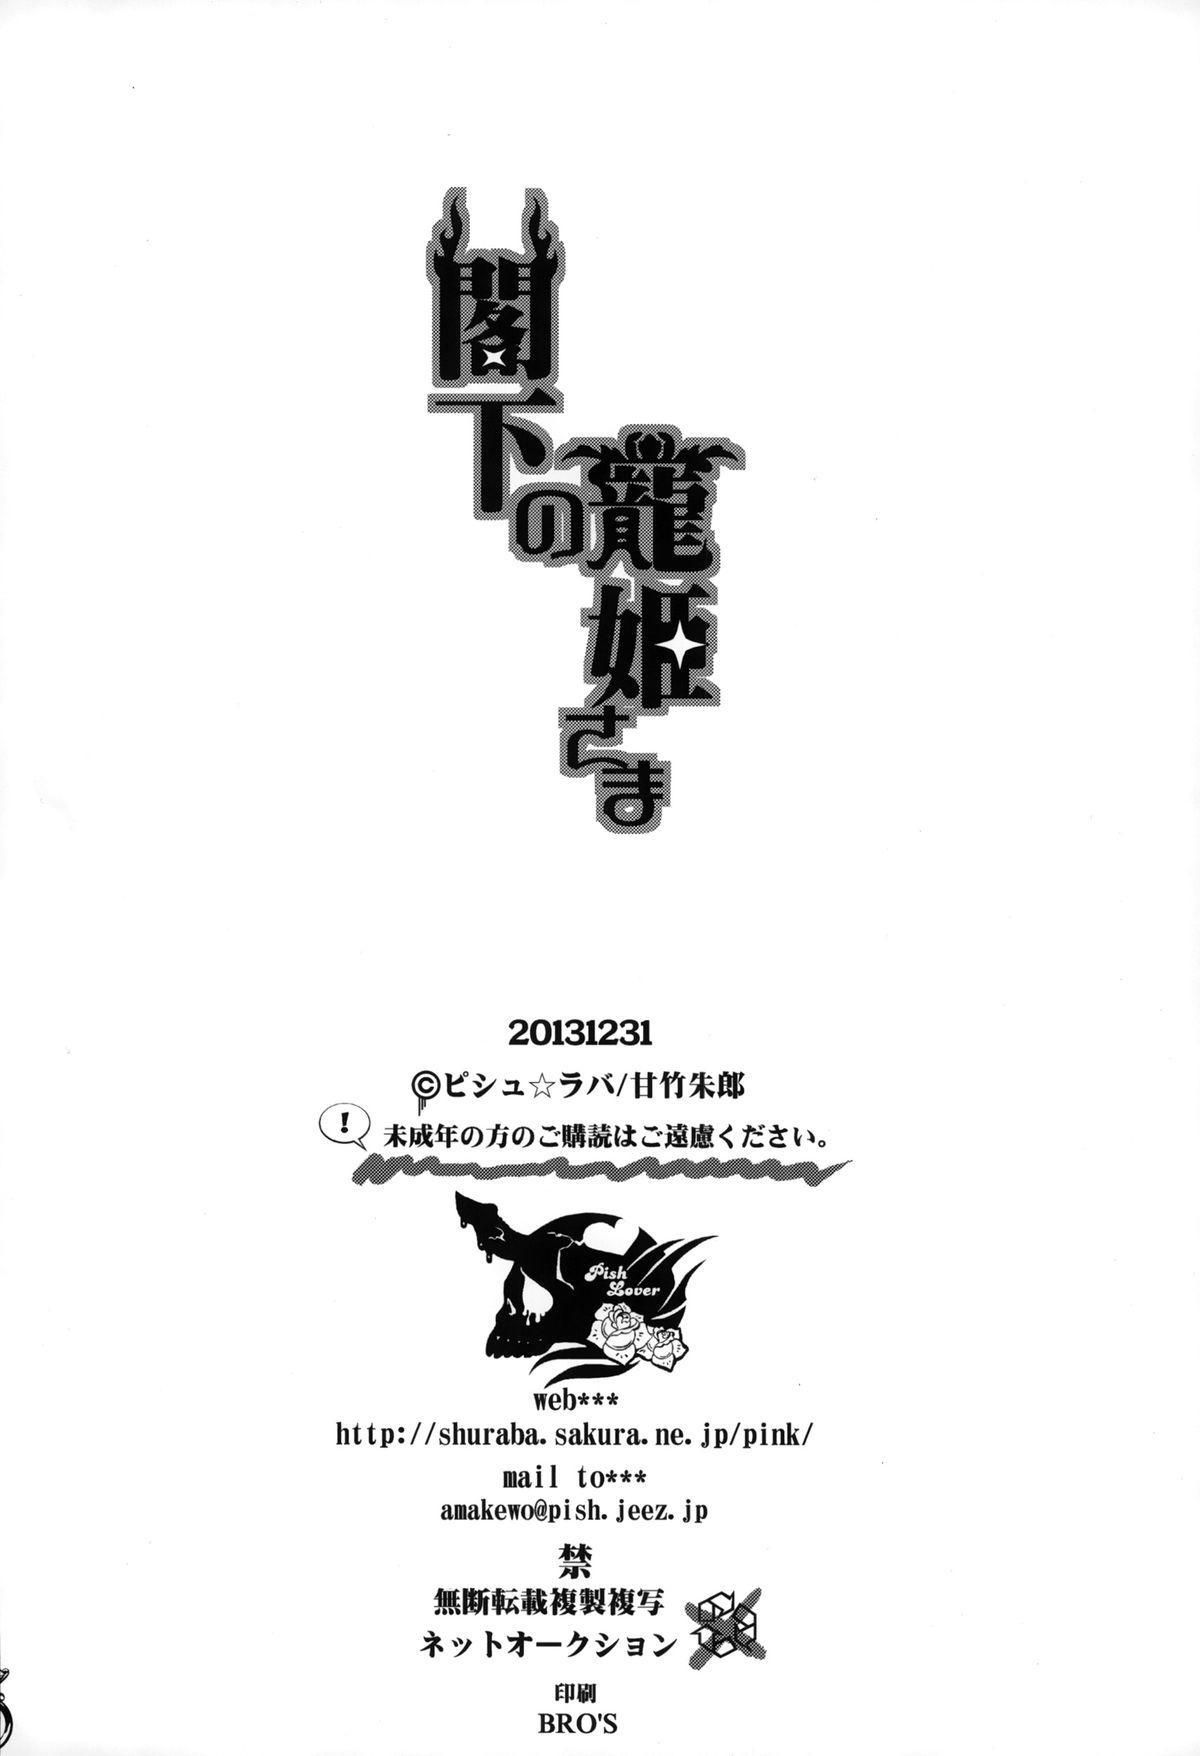 Kakka no Chouki-sama | The Mistress of His Excellency 32